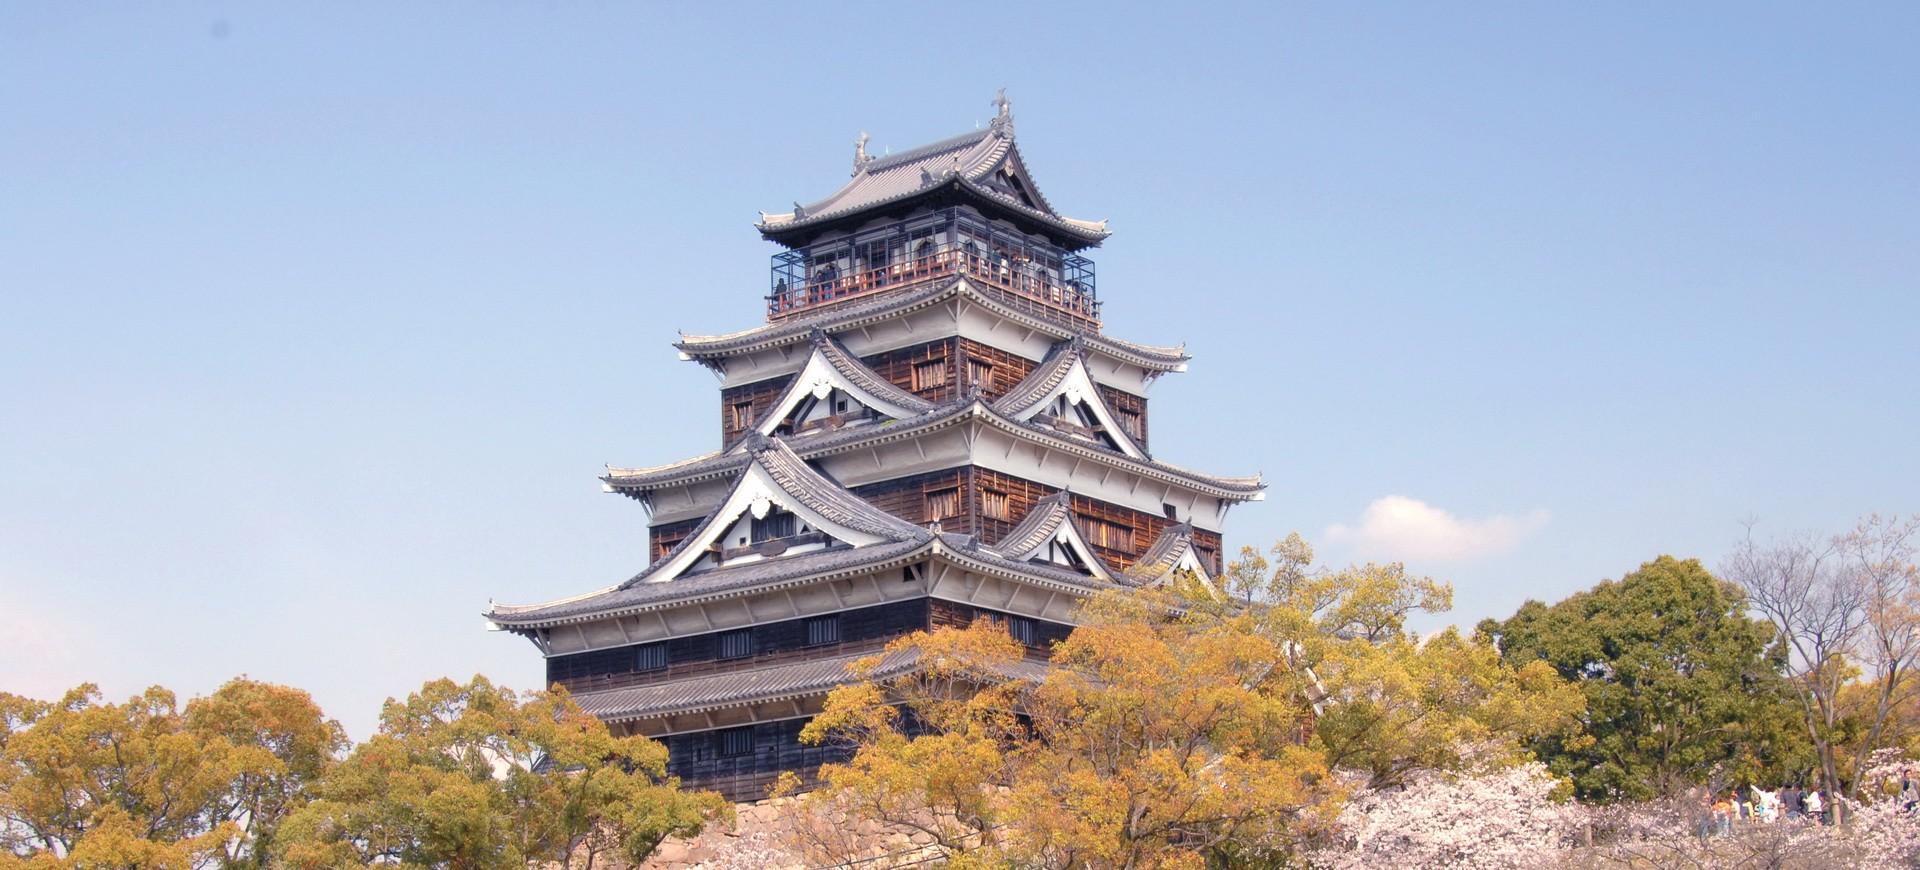 Chateau à Hiroshima